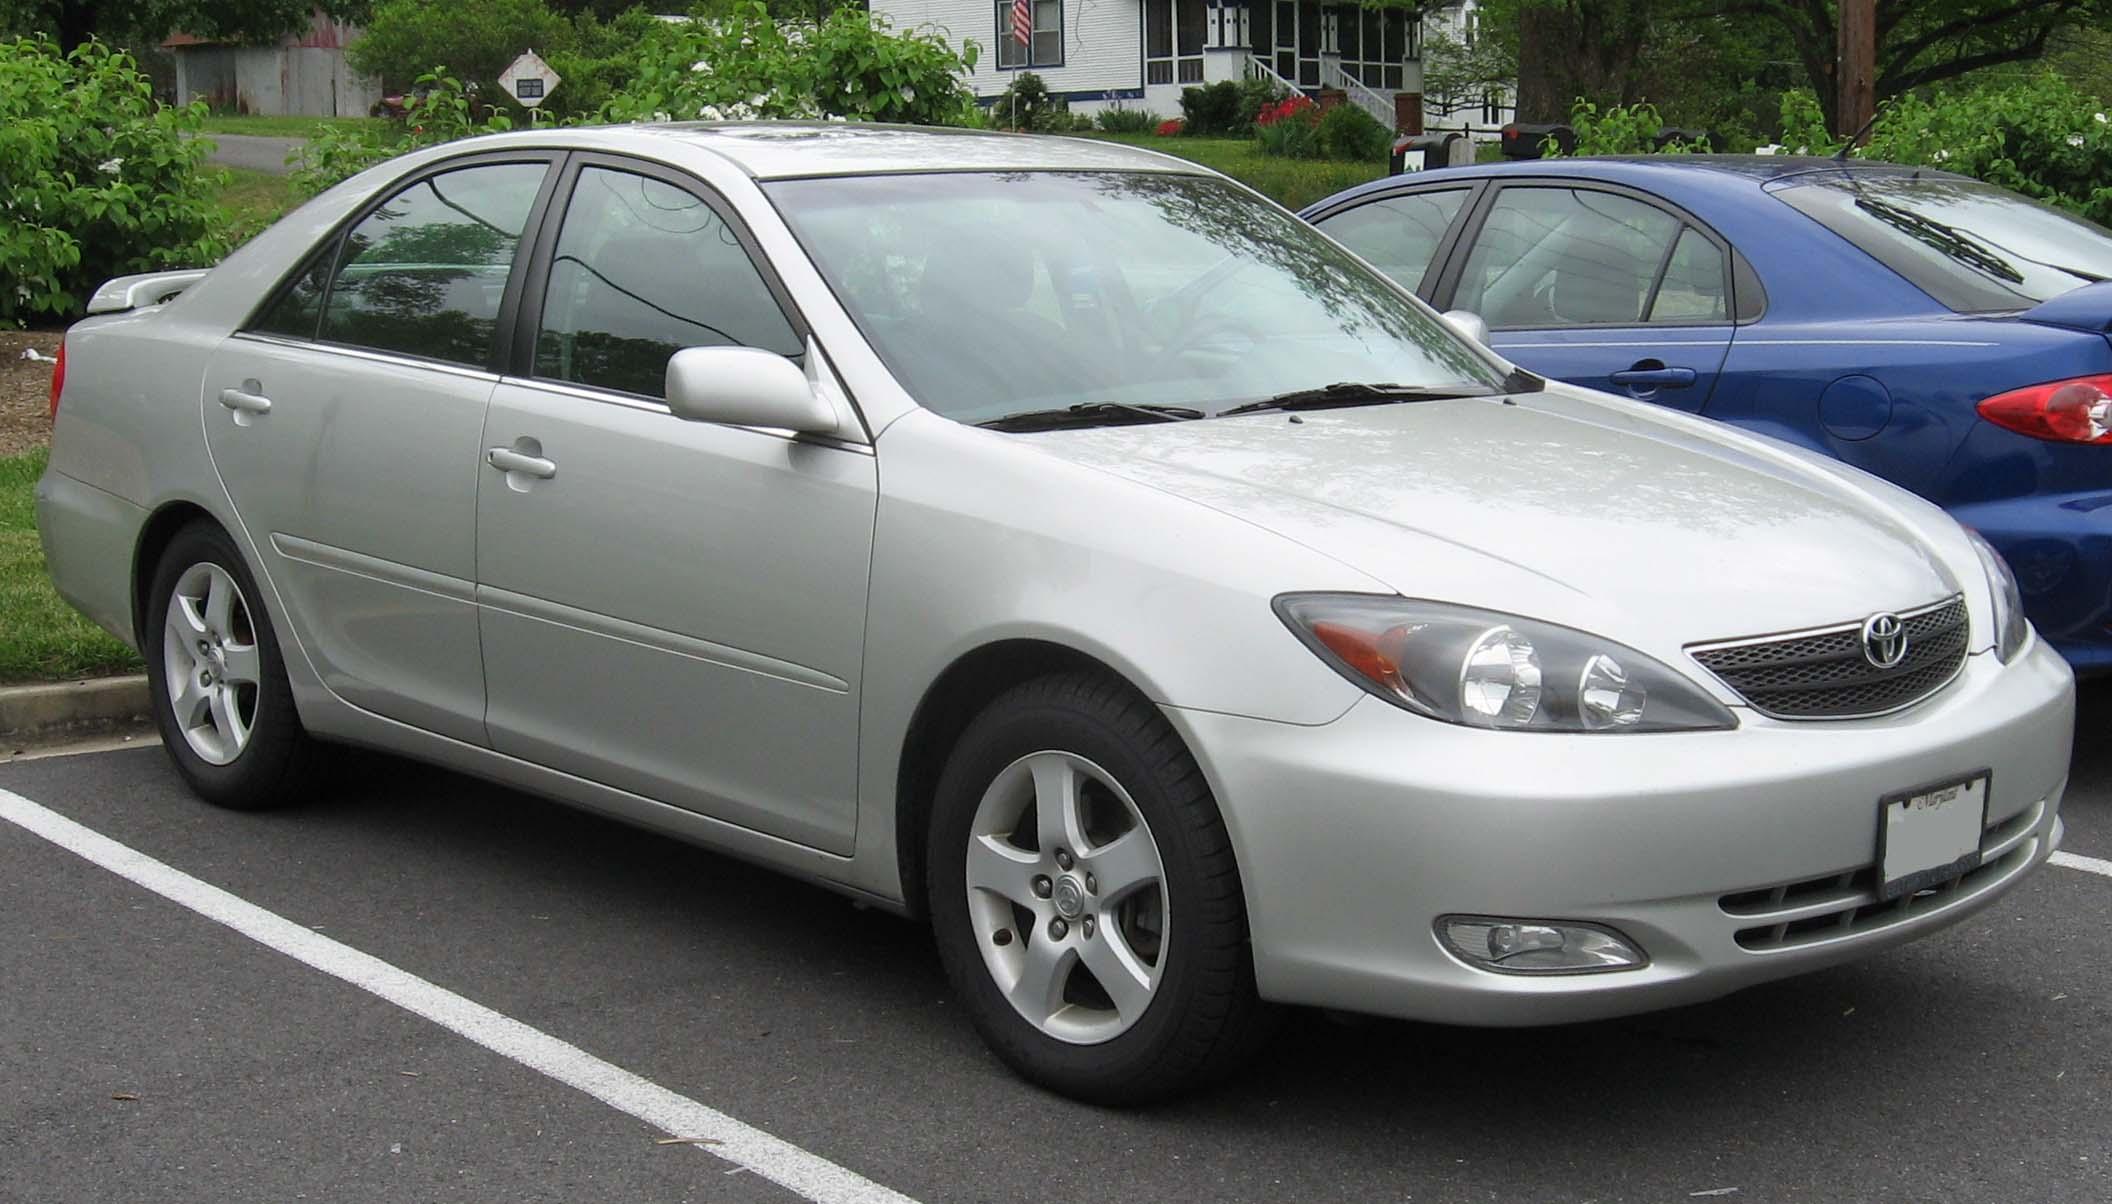 2002 Toyota Camry #8 Toyota Camry #8